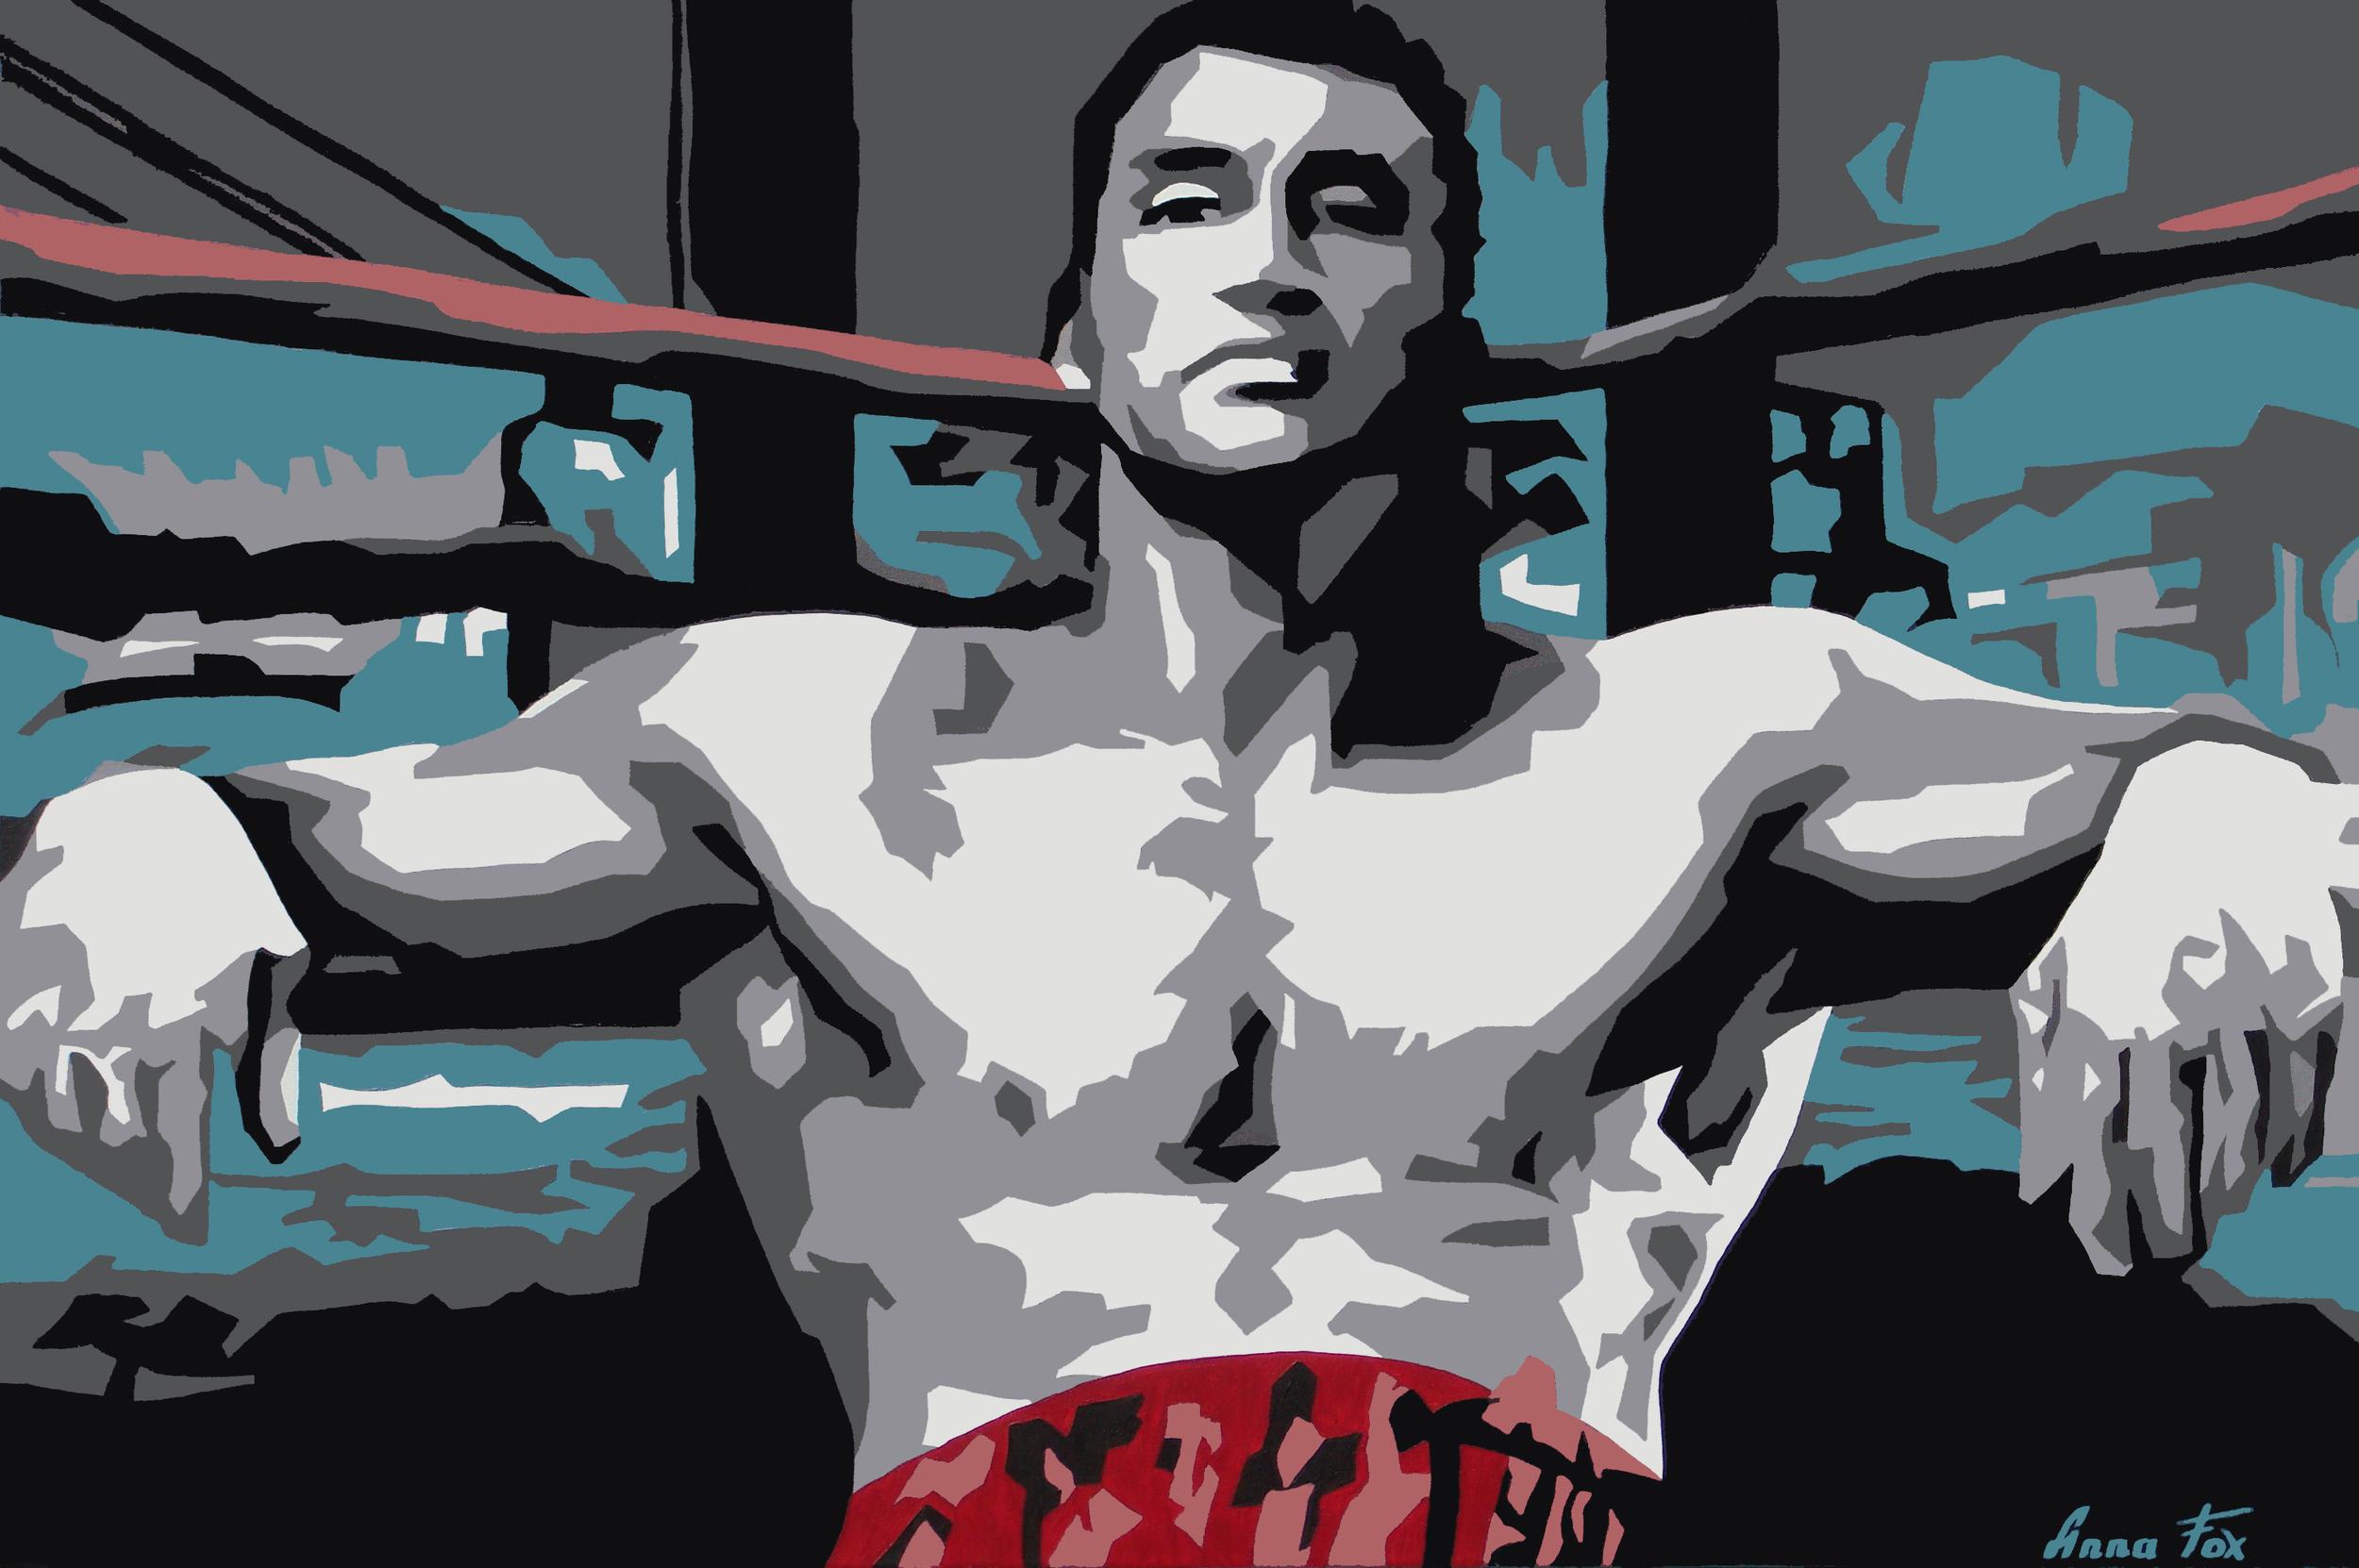 My painting ofVladimir Klitchko, Oil on Canvas 120x80 cm, 2010/03/16